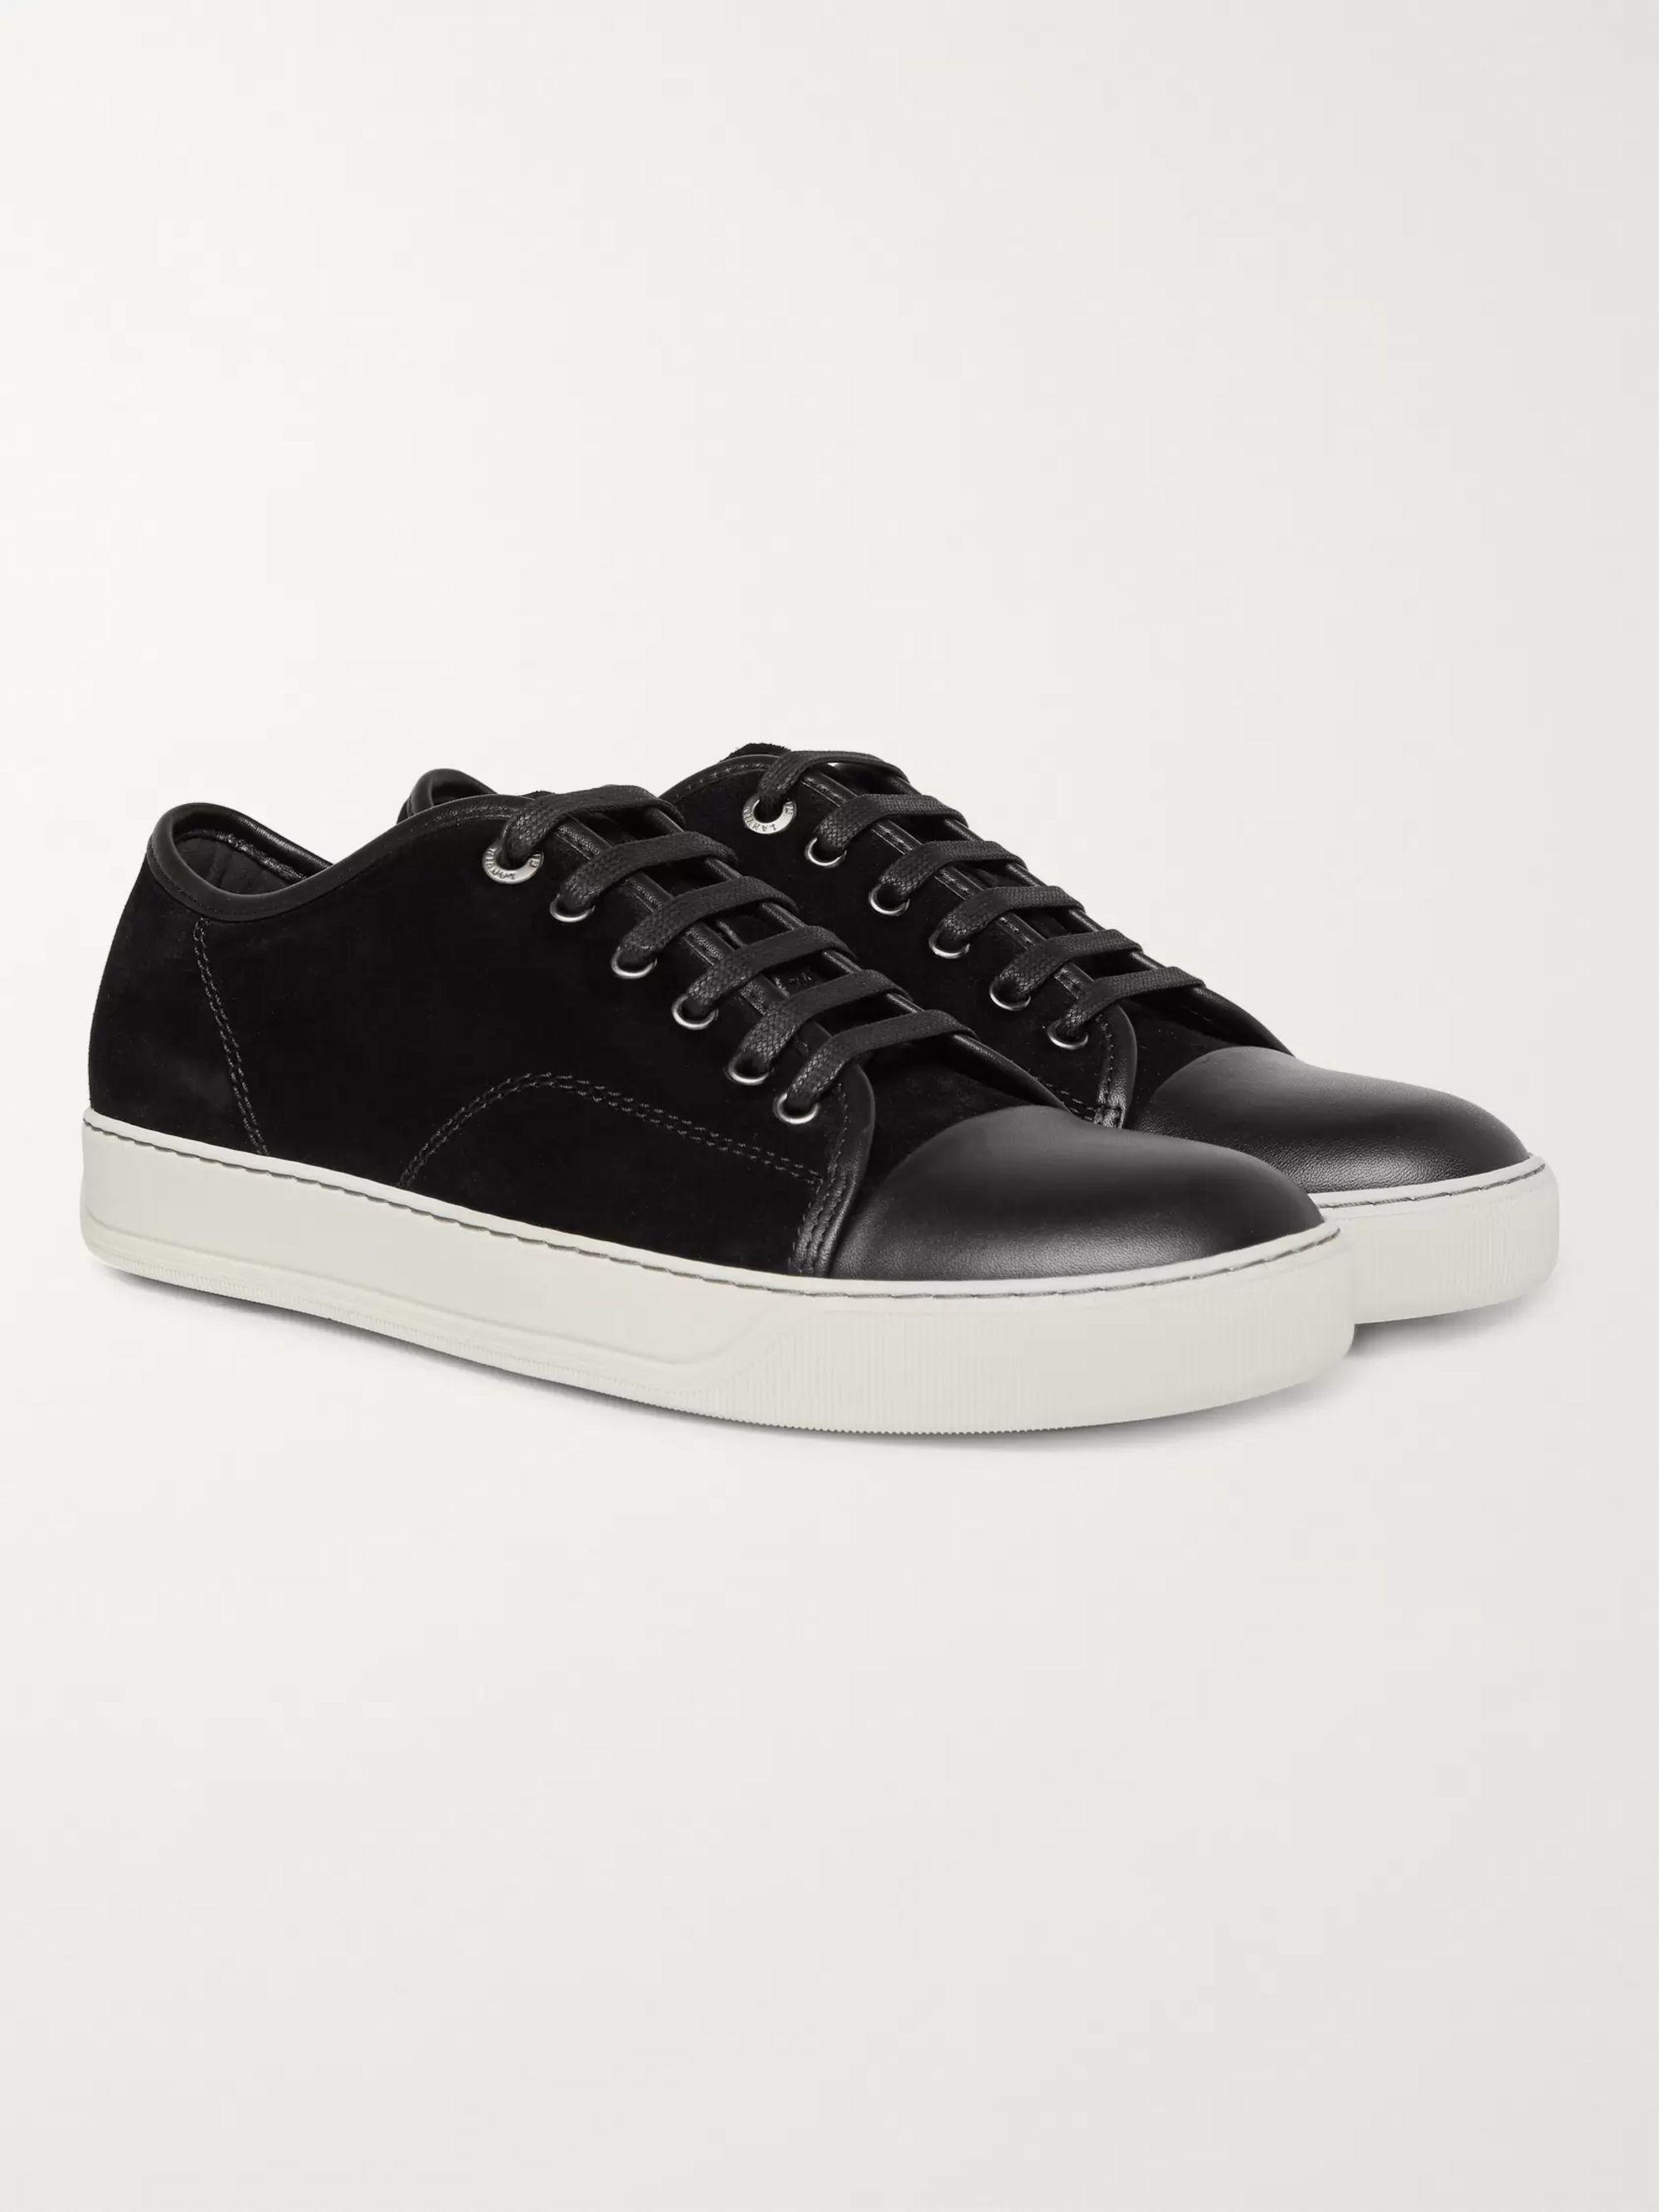 Leather Sneakers | Lanvin | MR PORTER